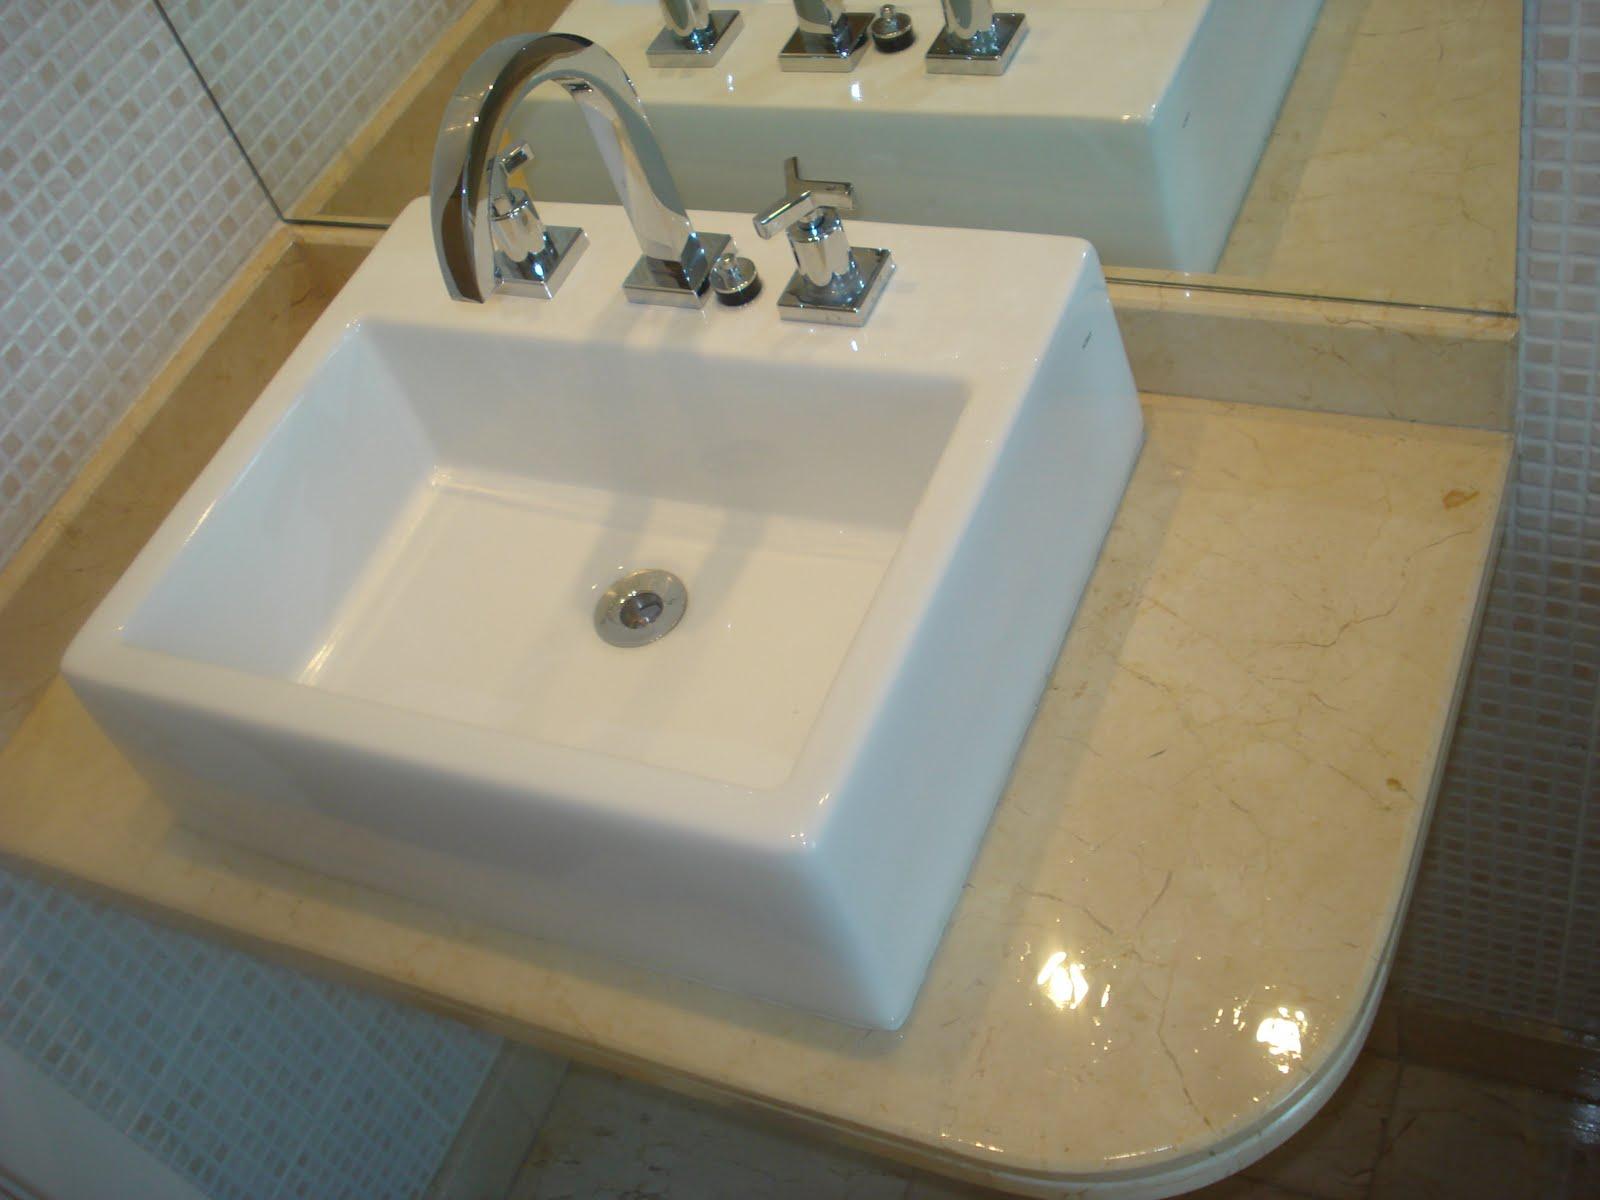 marmore crema marfil #7C6C49 1600x1200 Bancada Banheiro Crema Marfil